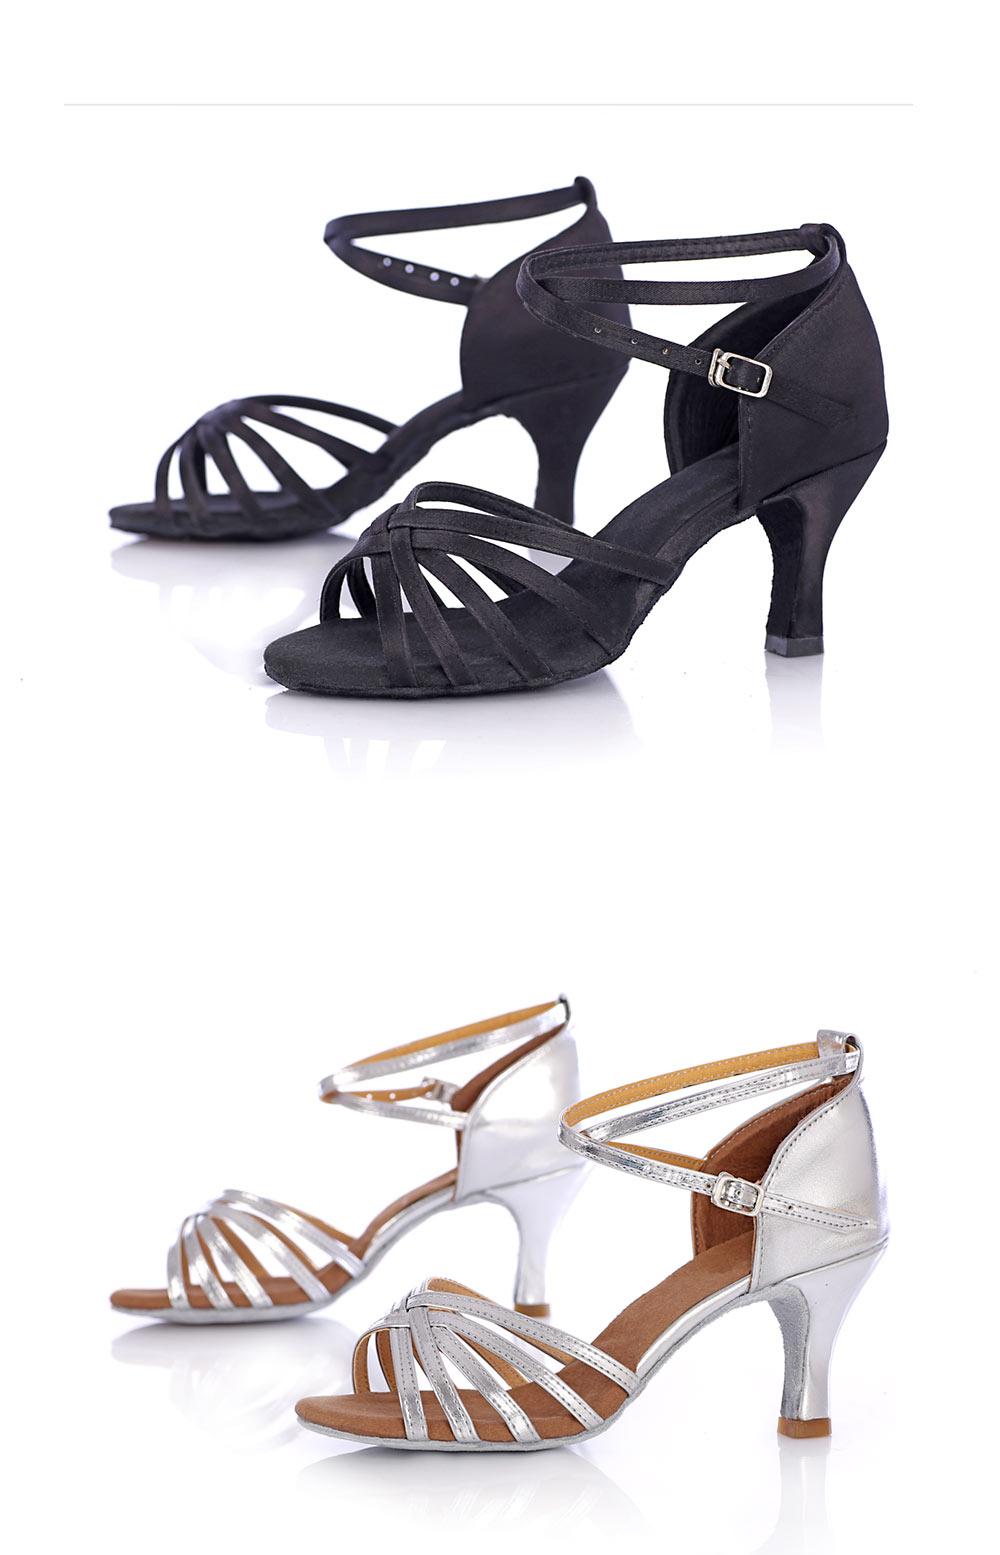 Latin Dance Shoes For Women Salsa Tango Ballroom Dance Shoes High Heels soft Dancing Shoes 5 7cm Heel zapatos baile comfortable (12)